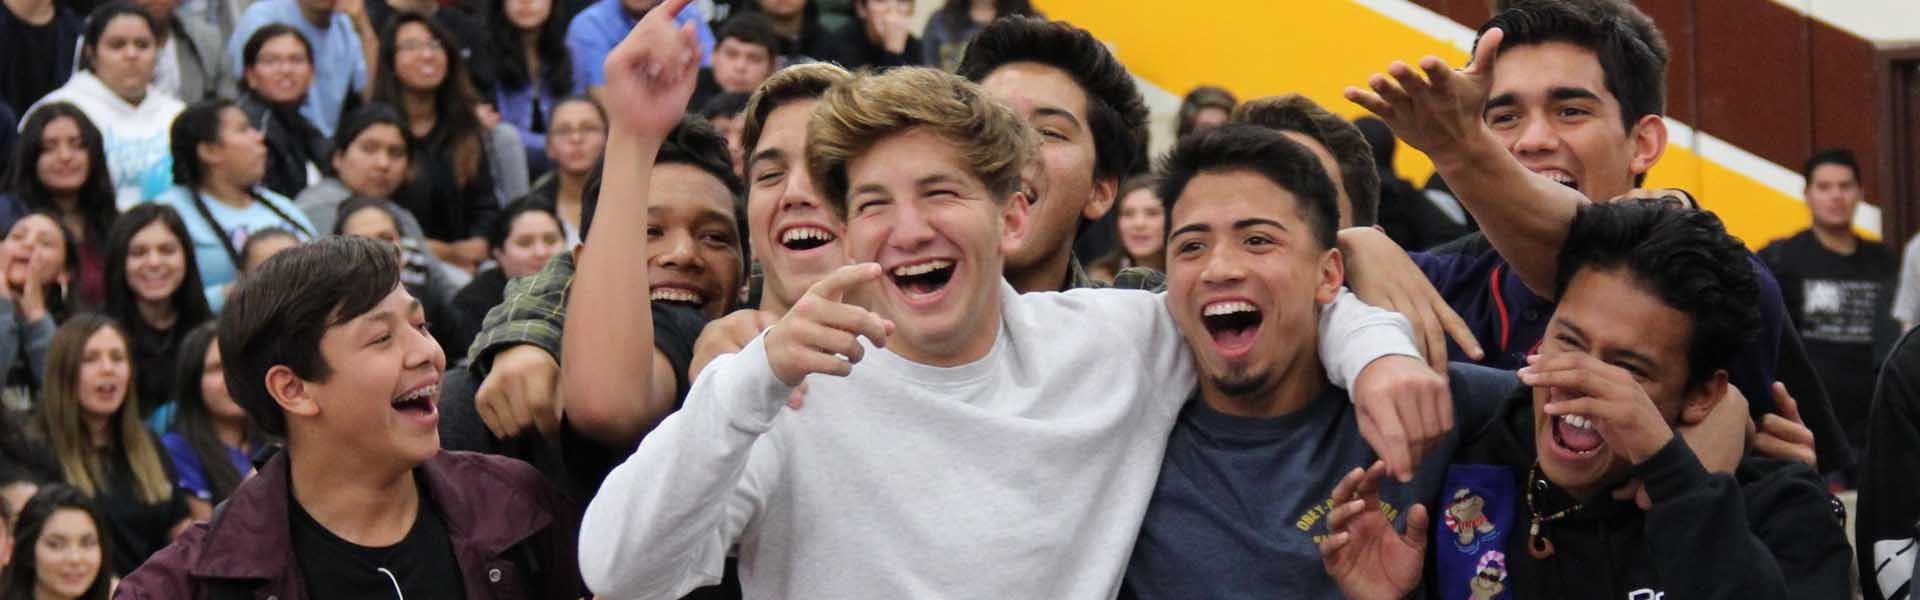 Chinovalley-Highschool-CA-Boys-MAin-Banner-US-2019